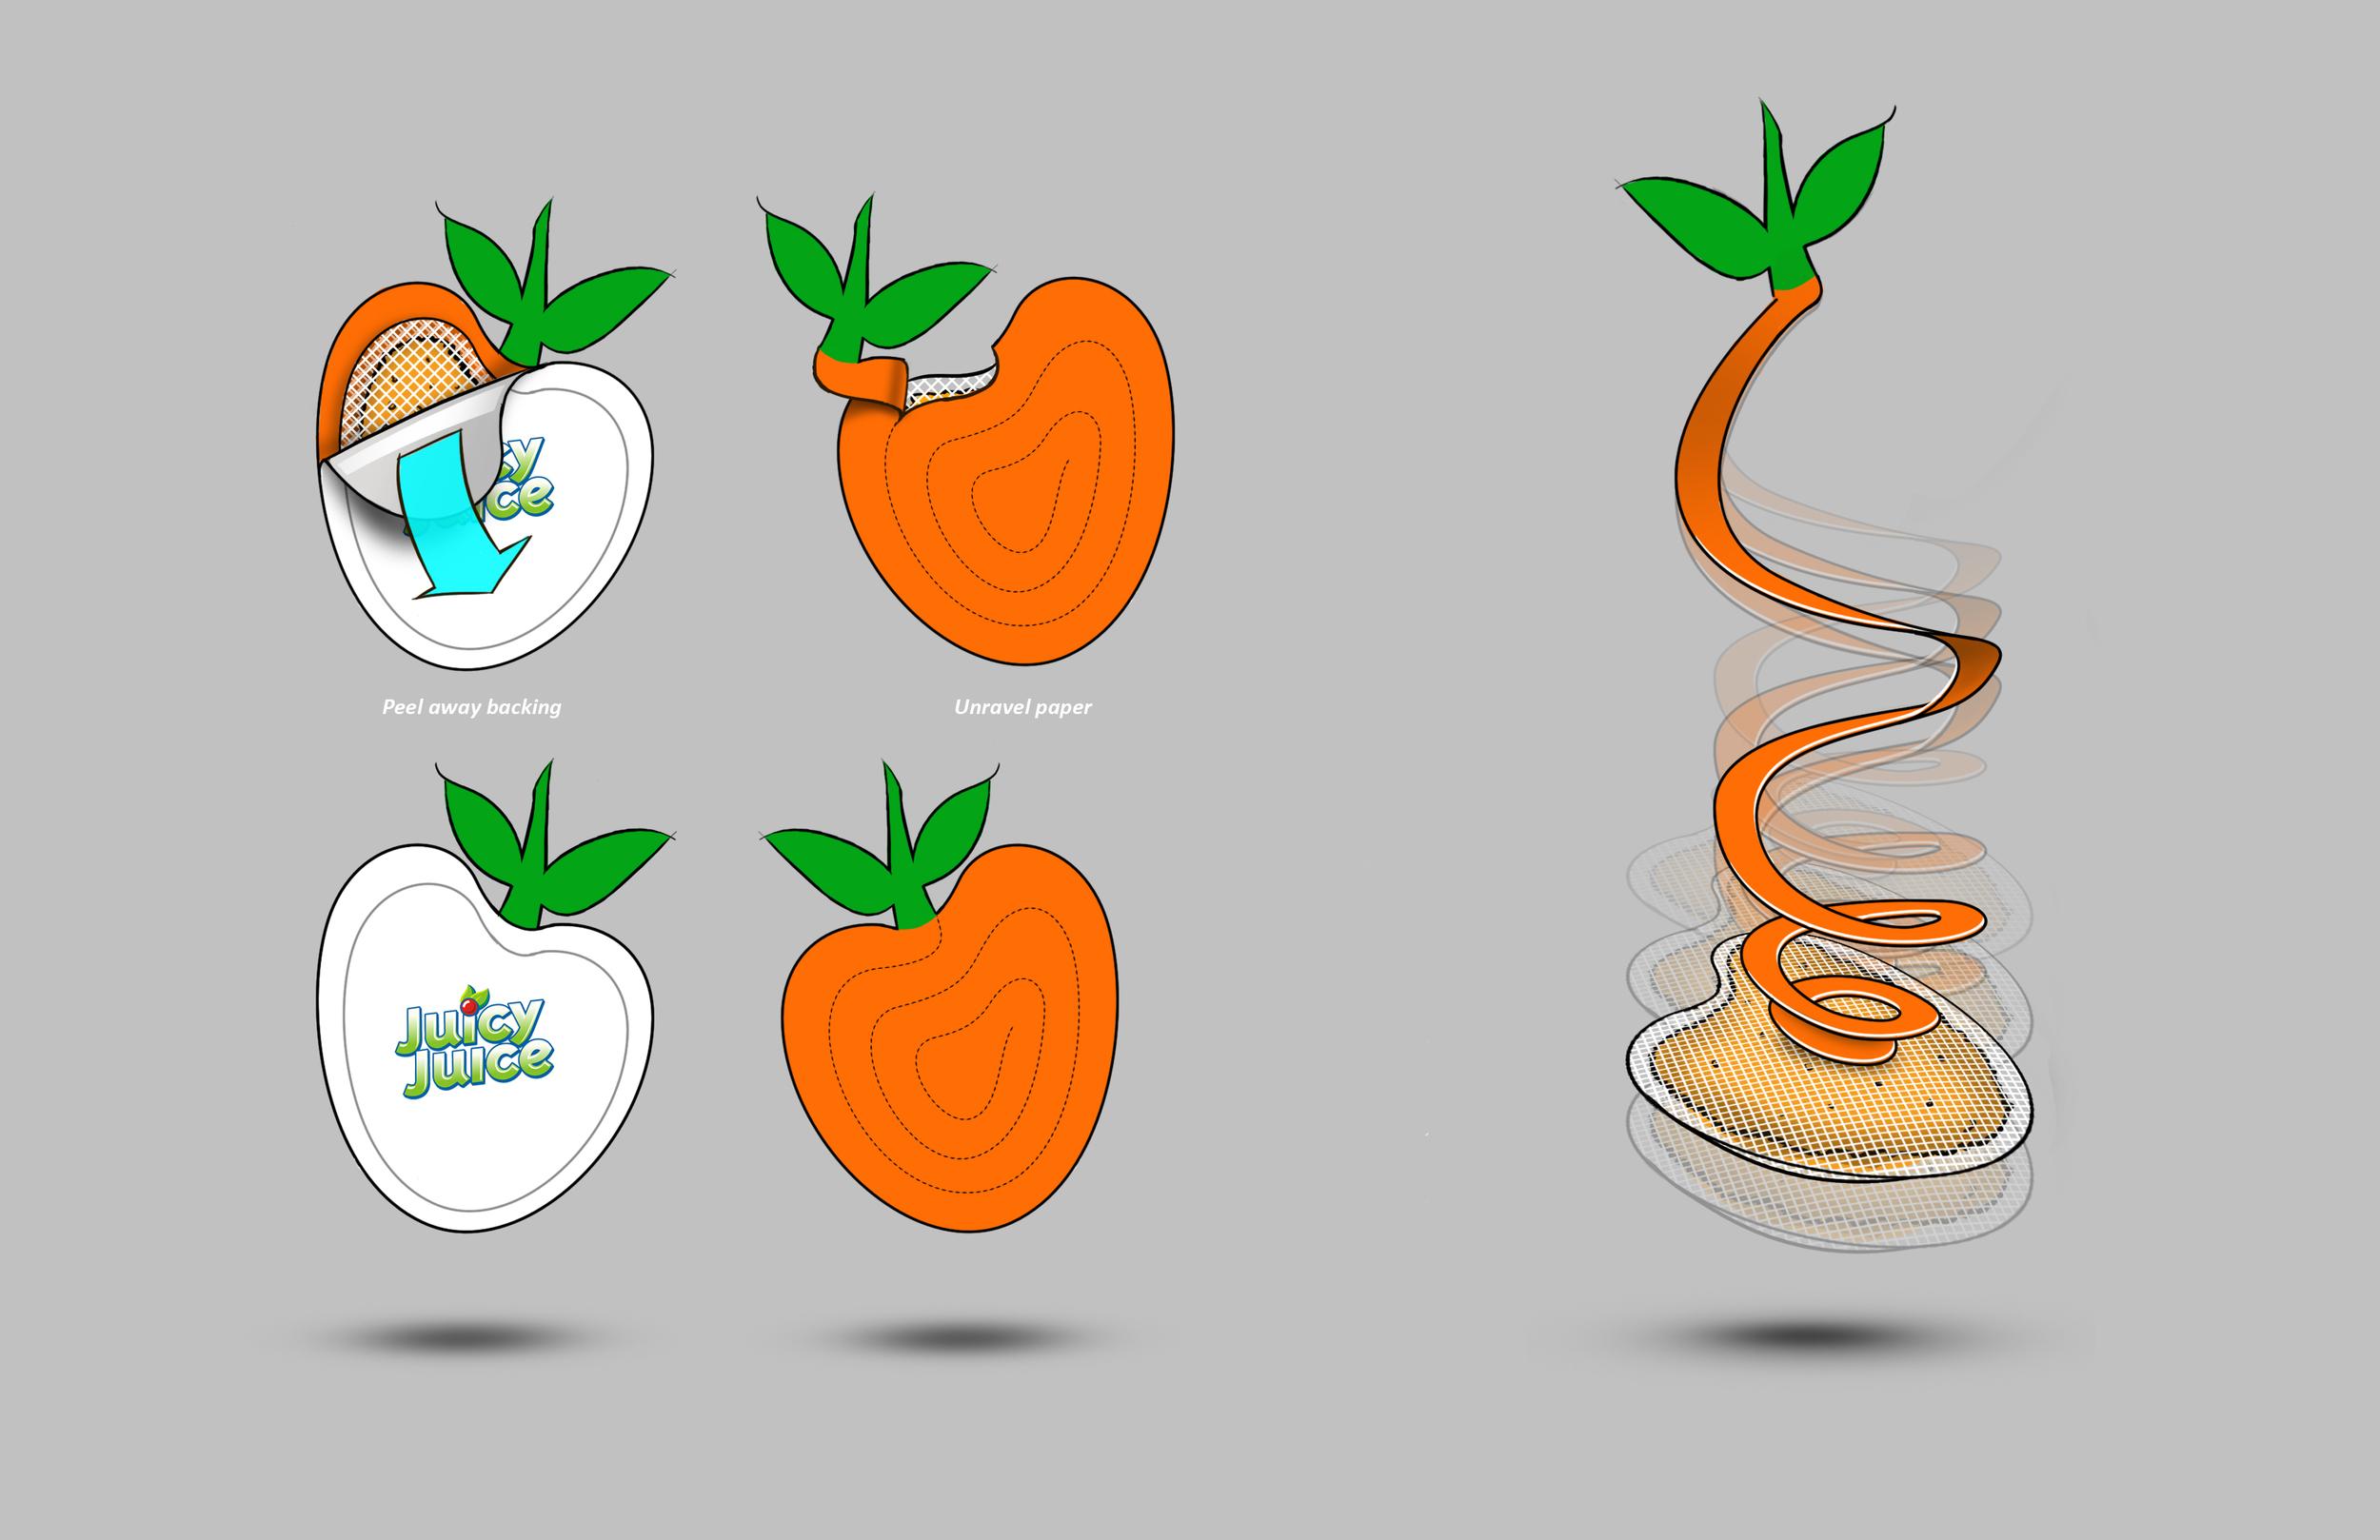 FruitBag_Update.jpg